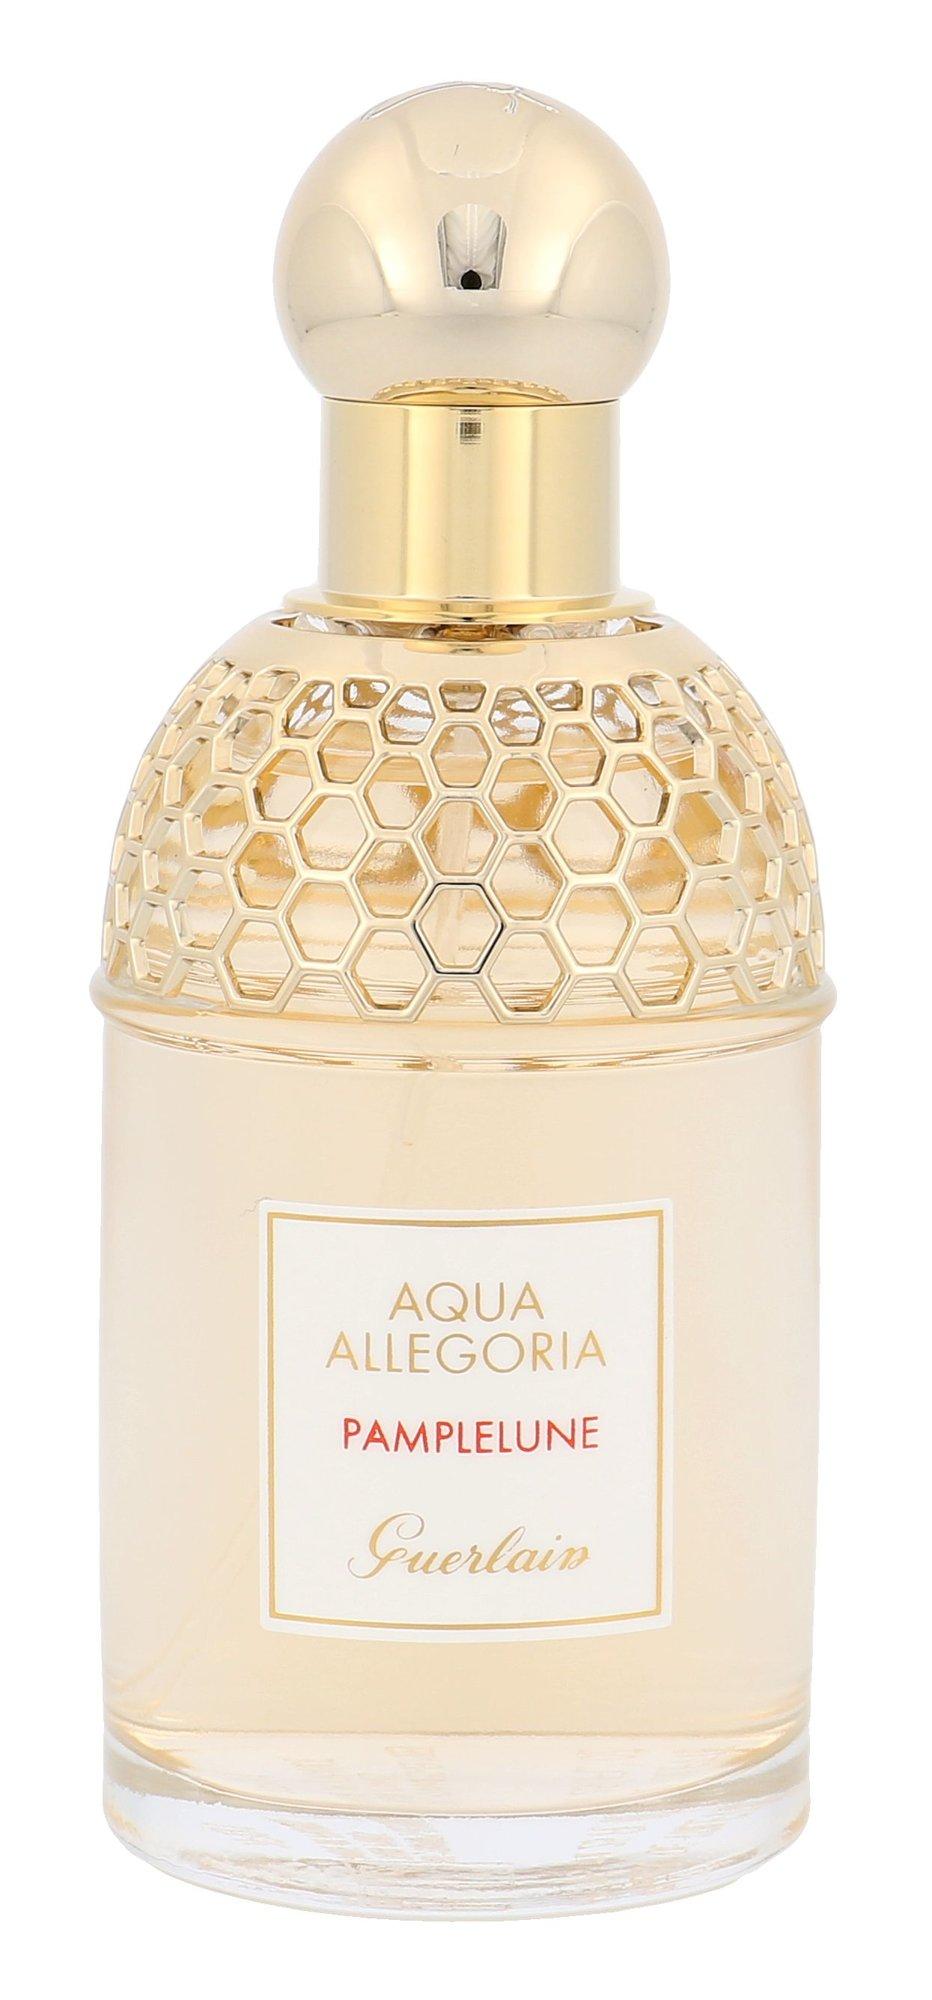 Guerlain Aqua Allegoria Pamplelune Eau de Toilette 75ml